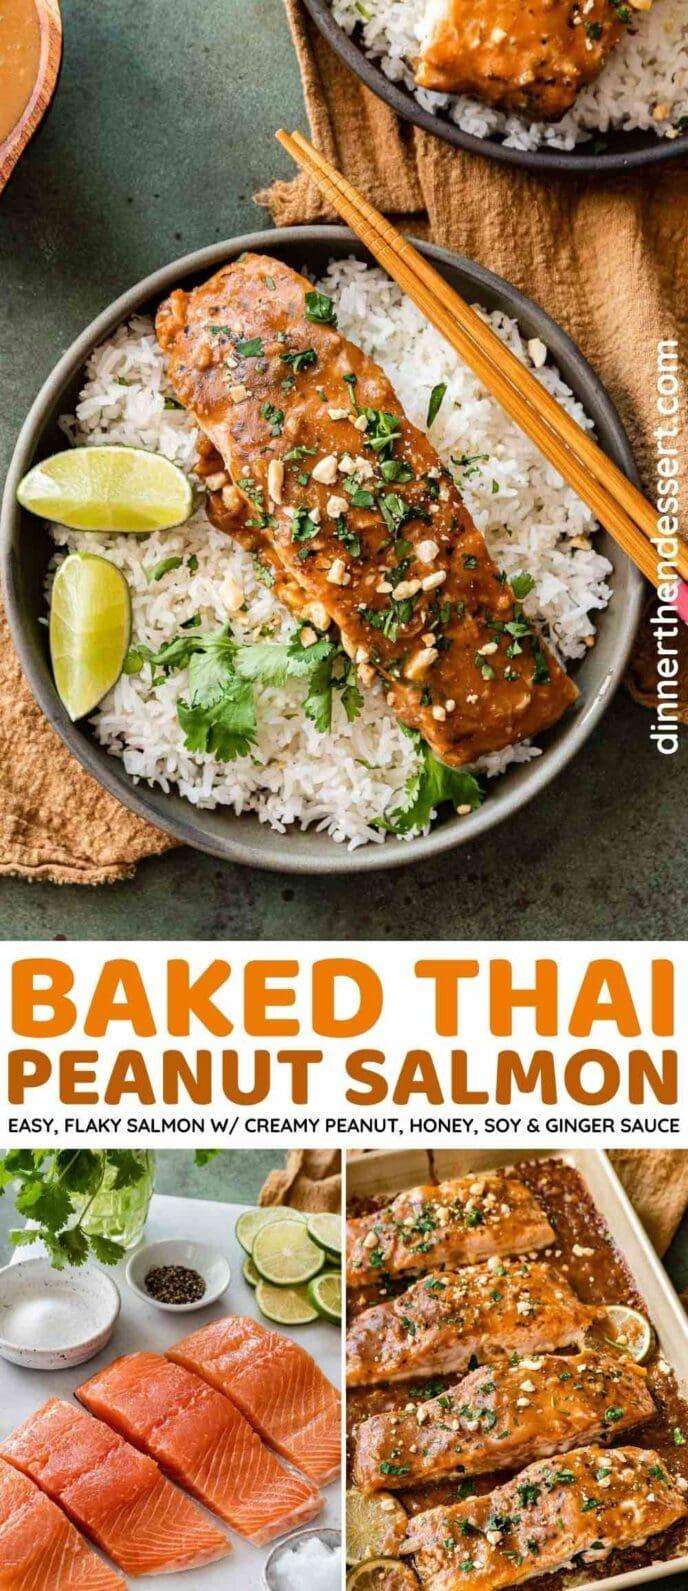 Baked Thai Peanut Salmon collage